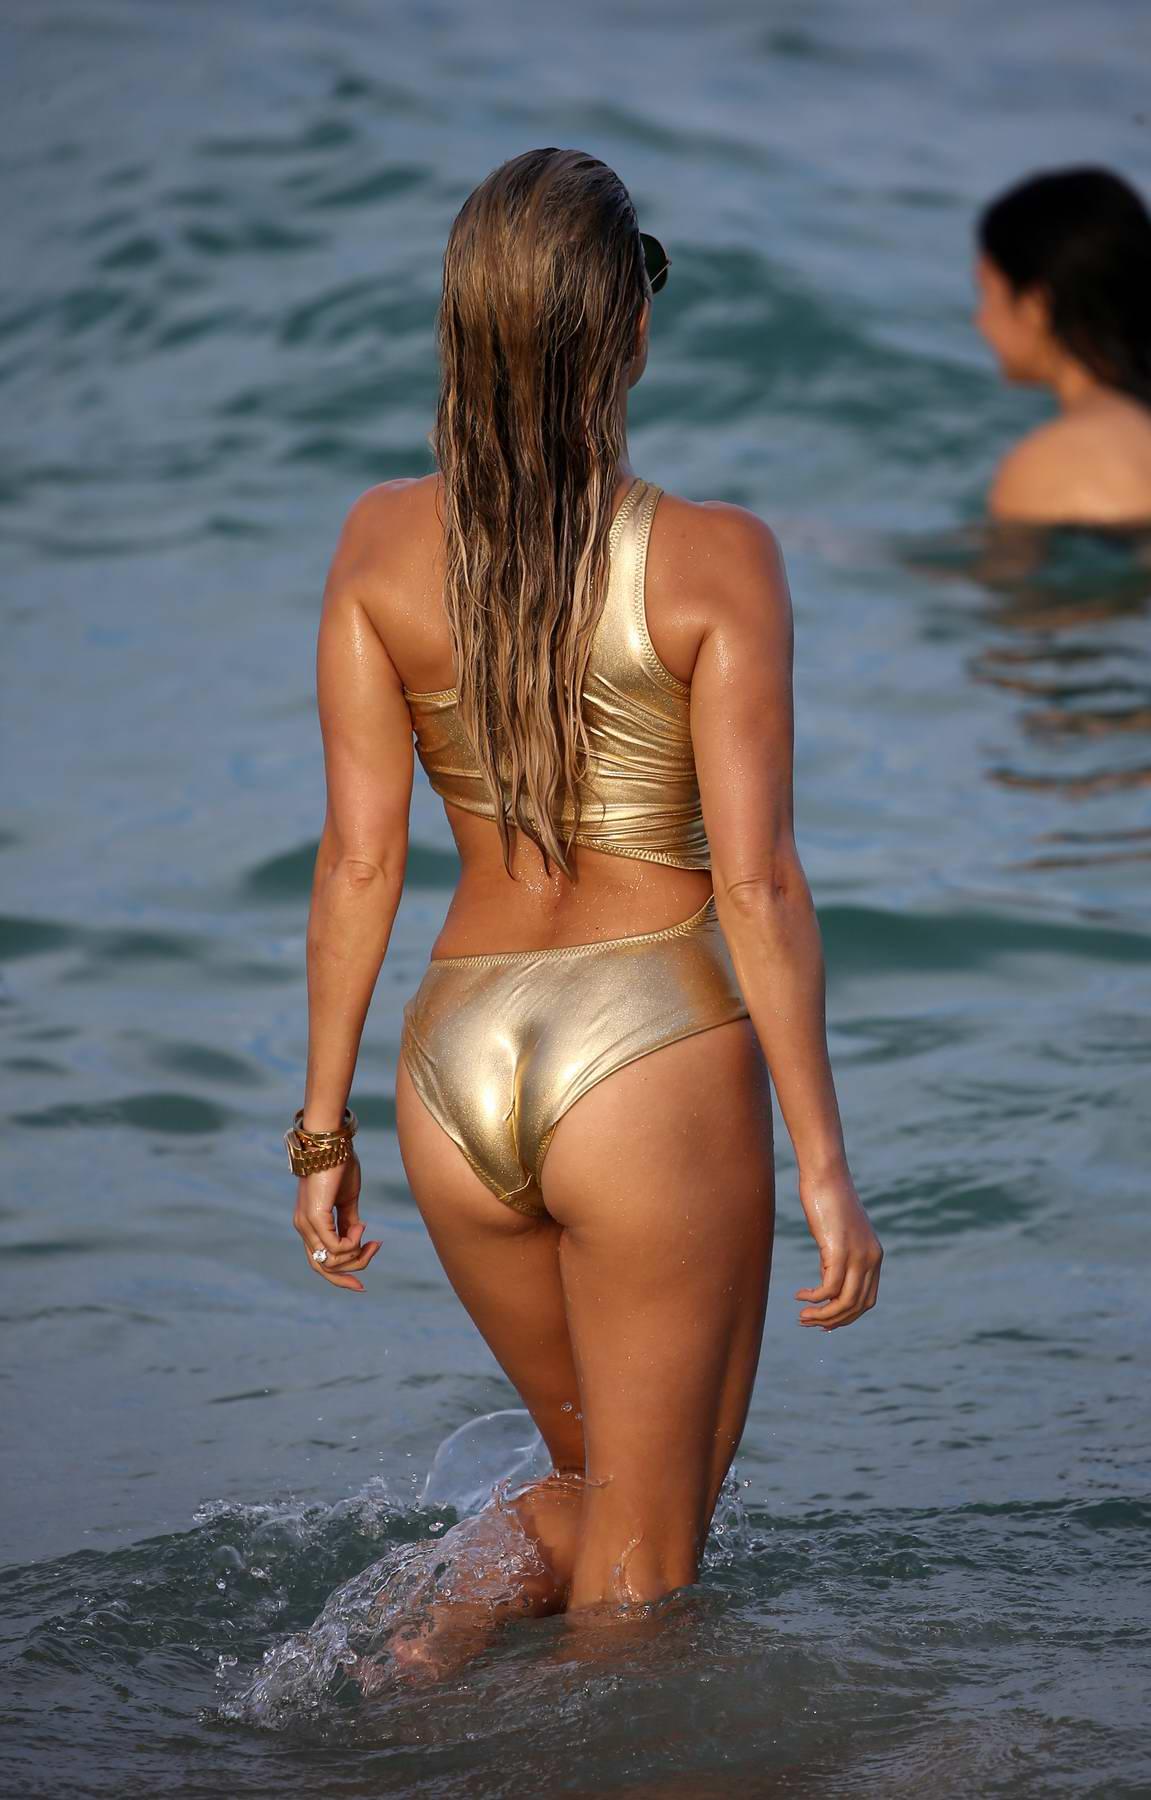 Sideboobs Rachel Roberts (actress) nudes (22 pictures) Cleavage, 2020, swimsuit